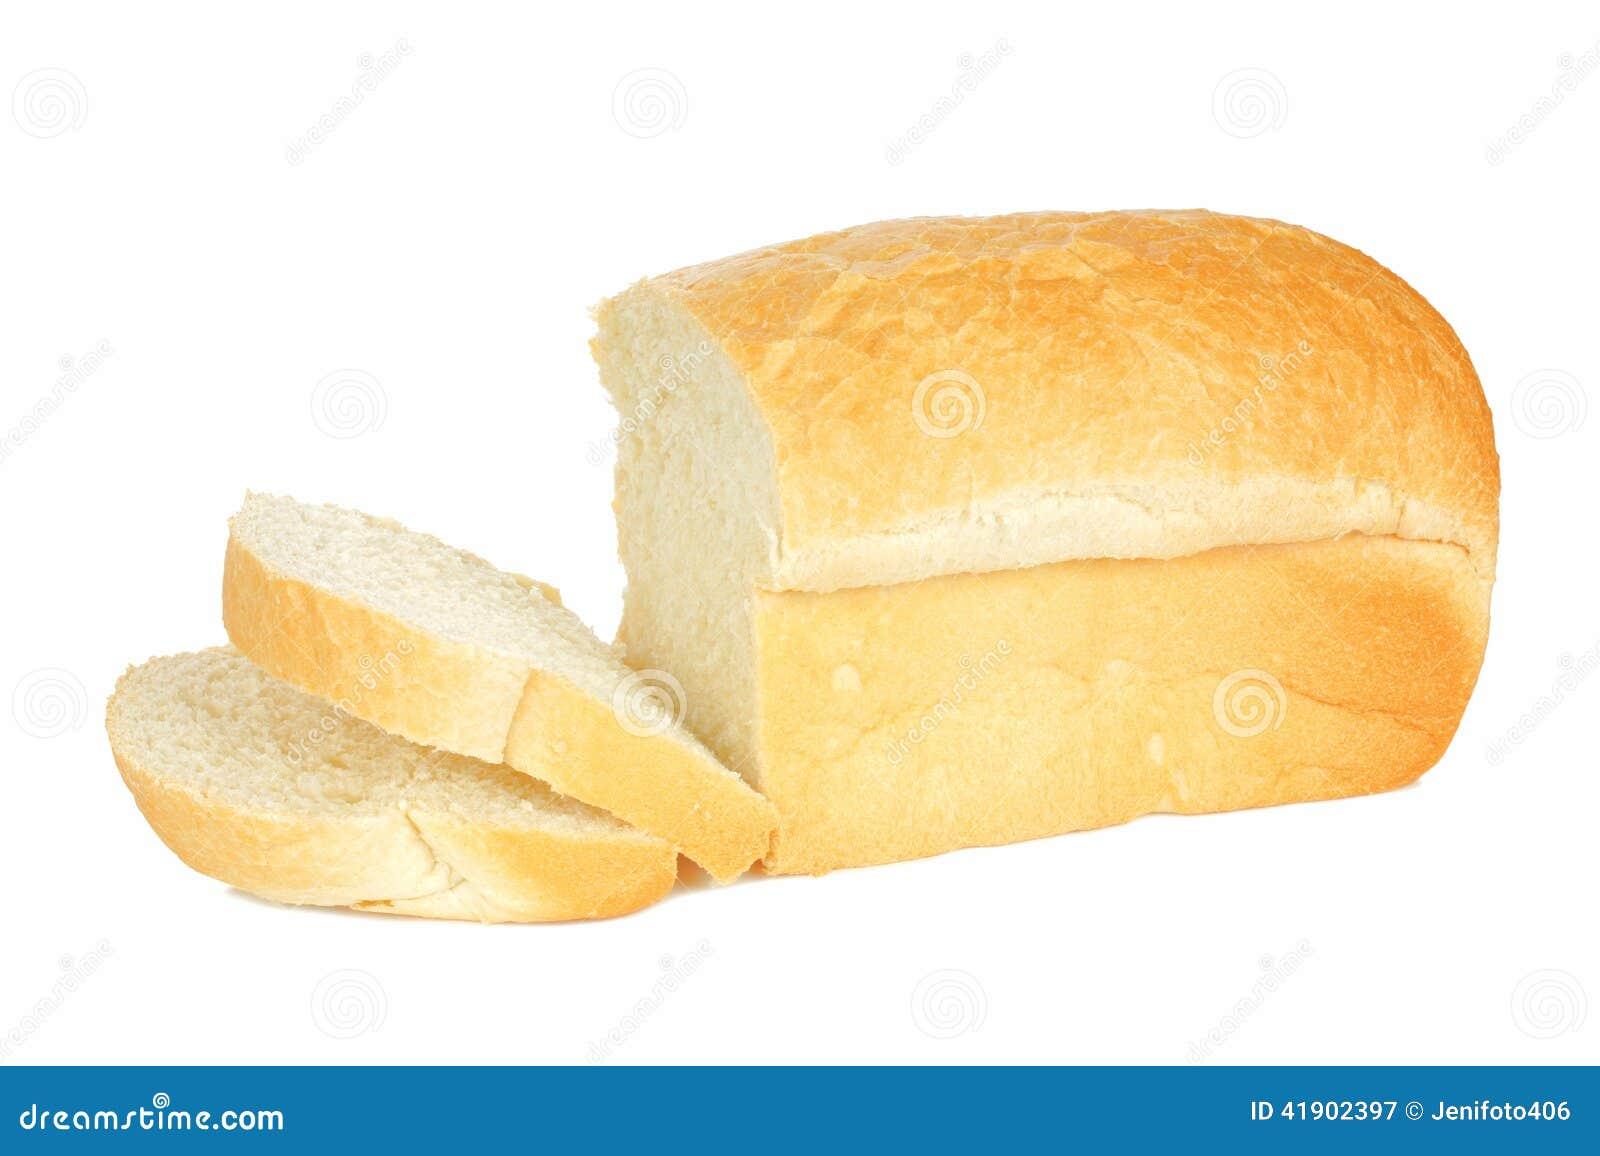 Pan del pan fresco